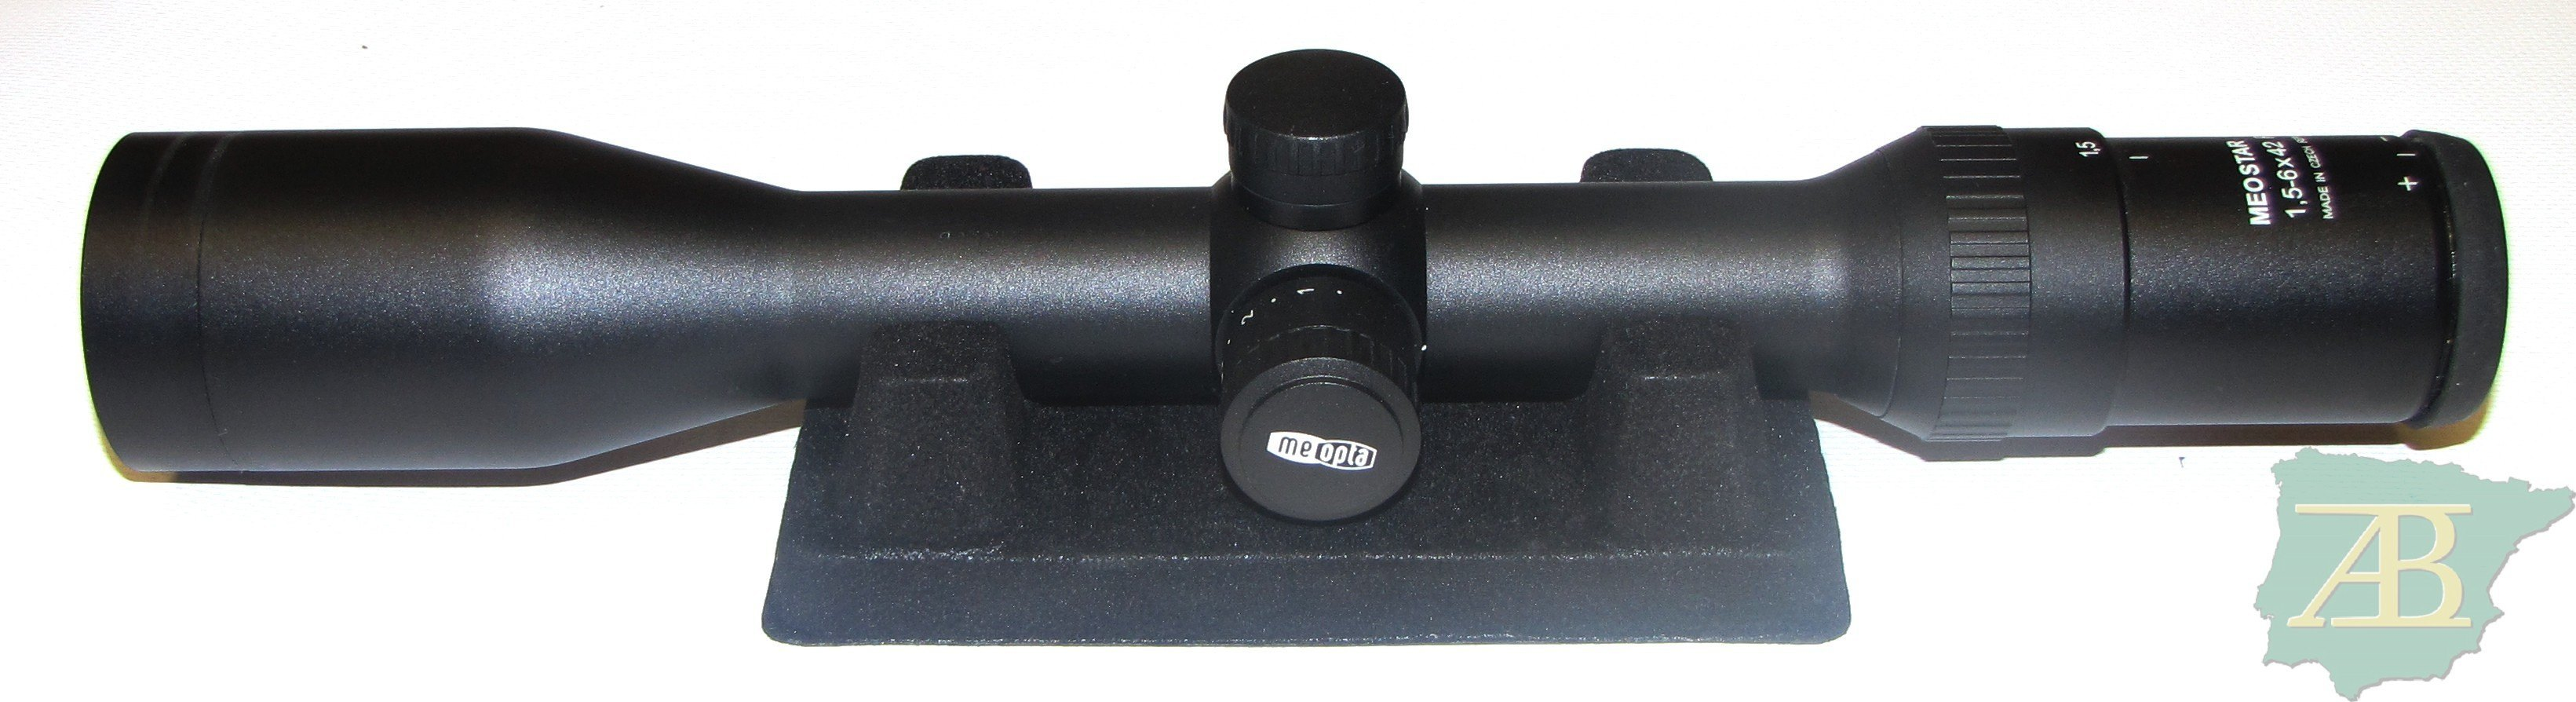 VISOR MEOPTA MEOSTAR R1 1.5-6X42 RD